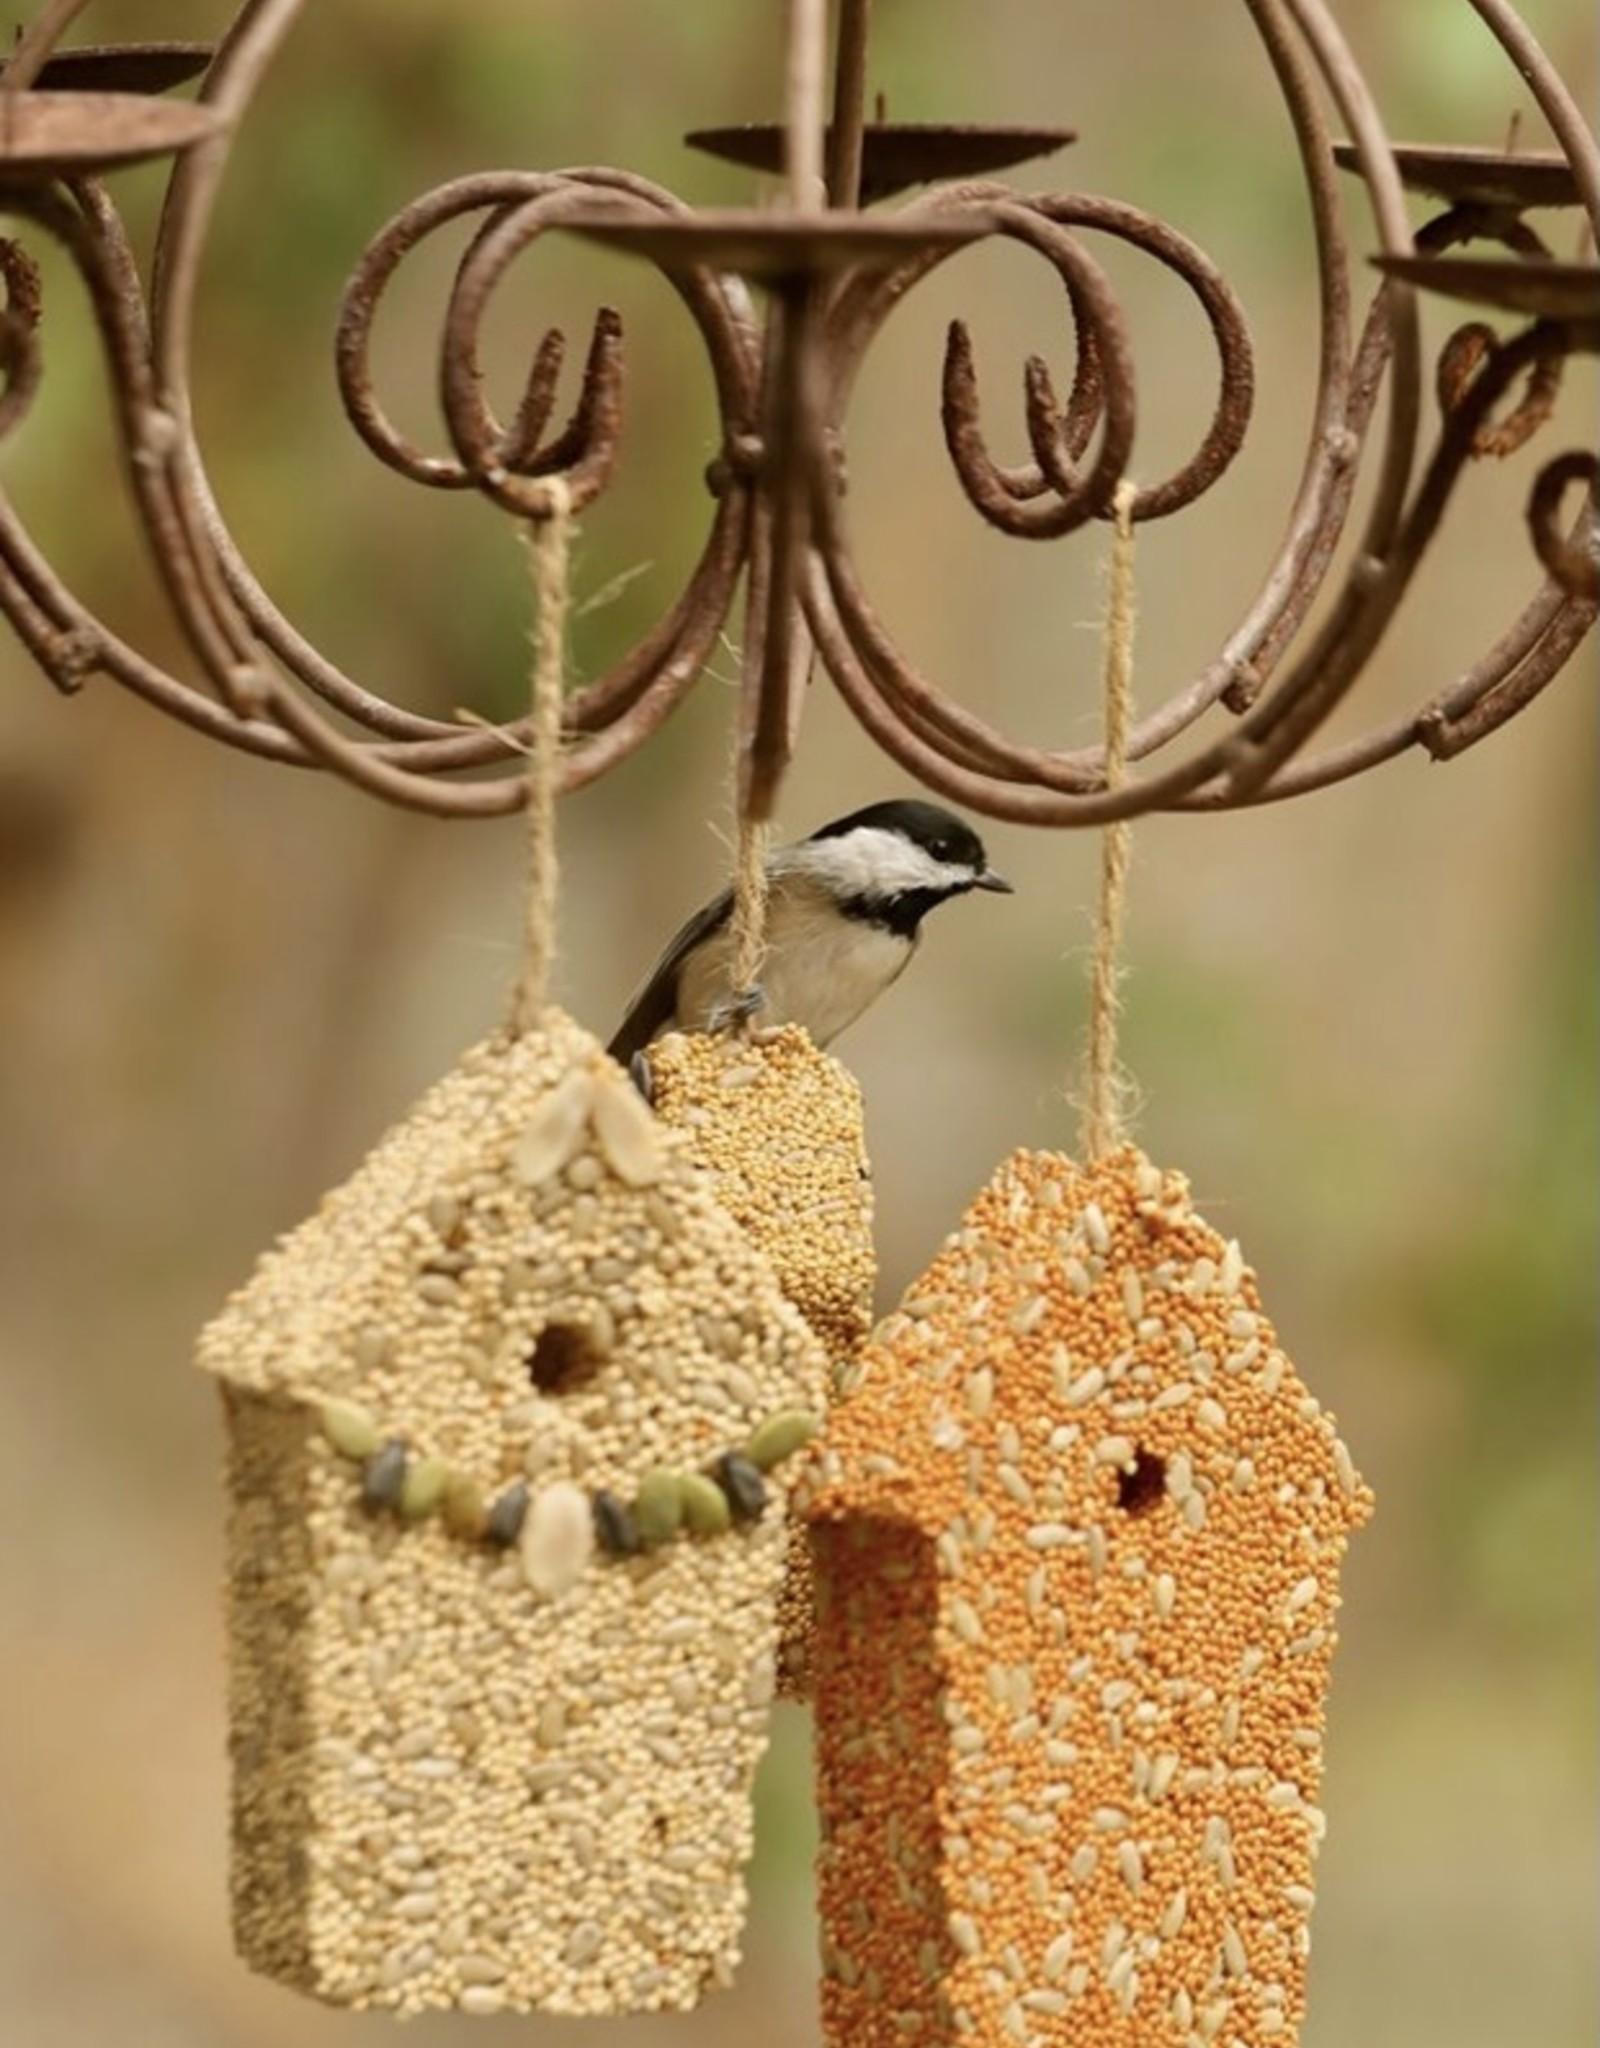 MR. BIRD HOME TWEET HOME BIRDSEED